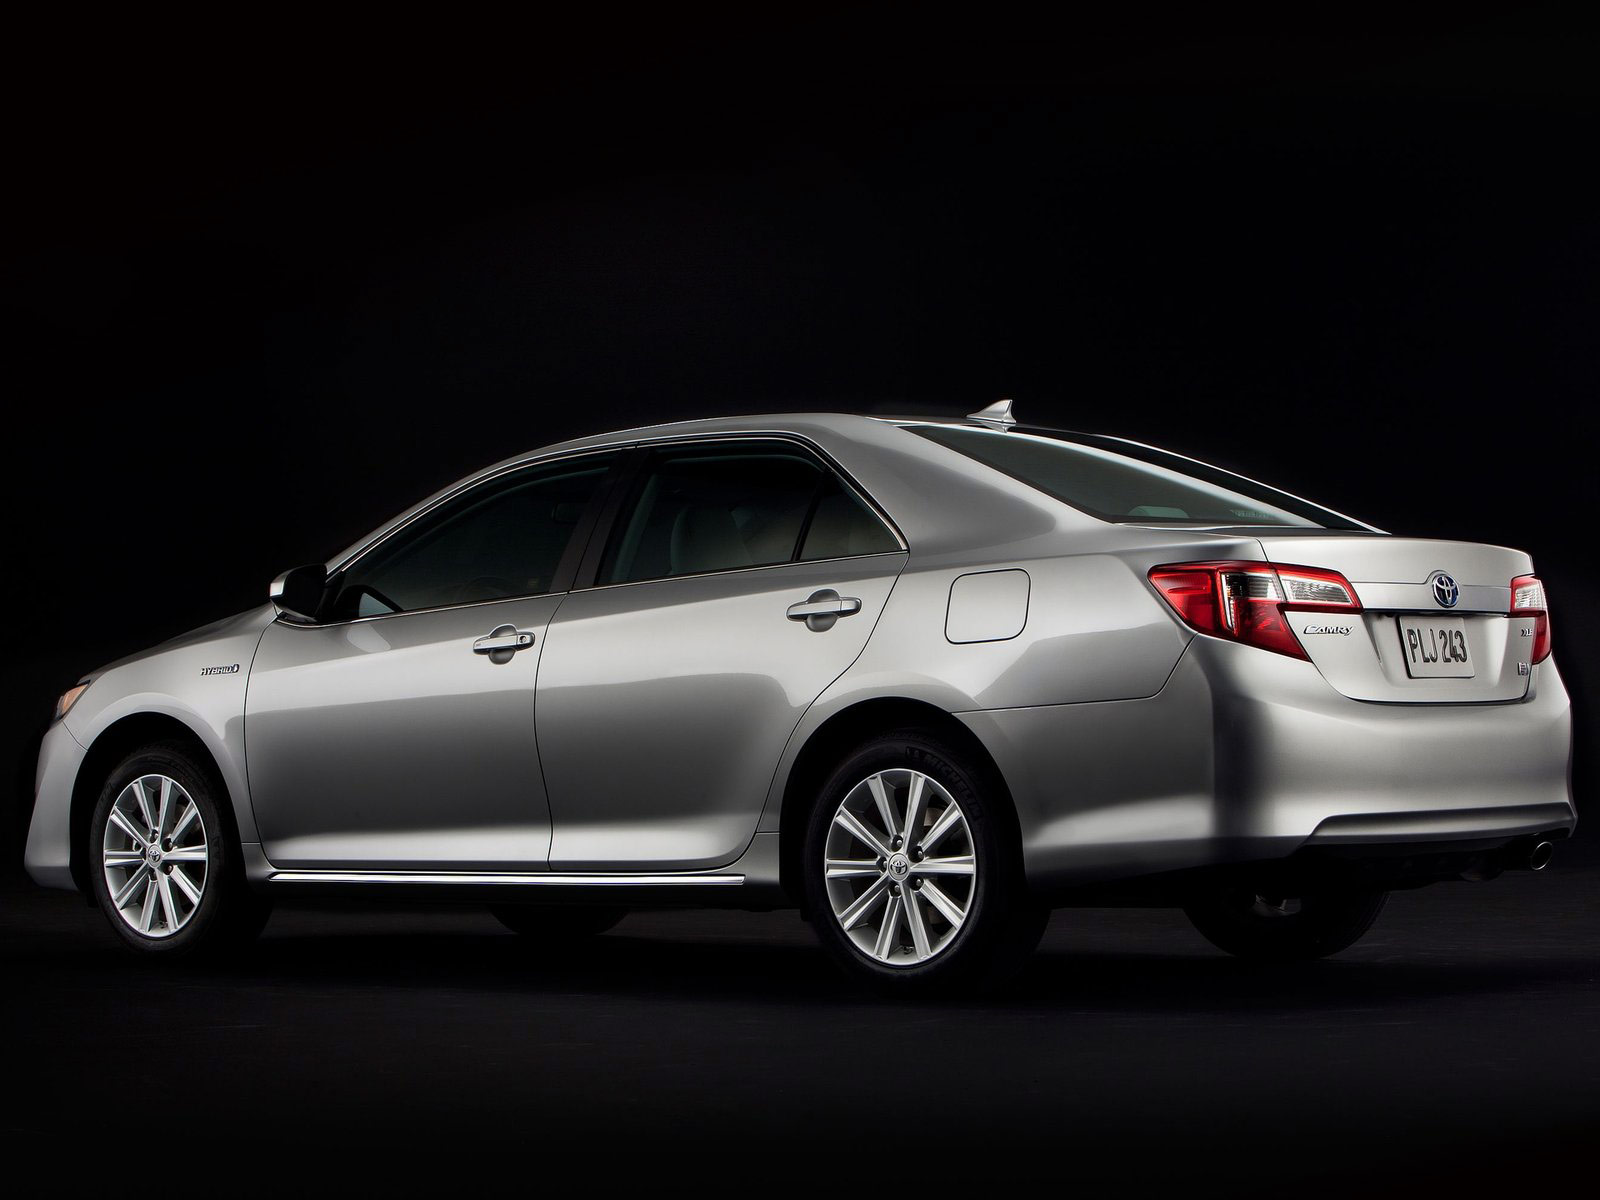 2012 Toyota Camry Hybrid Car Insurance Information